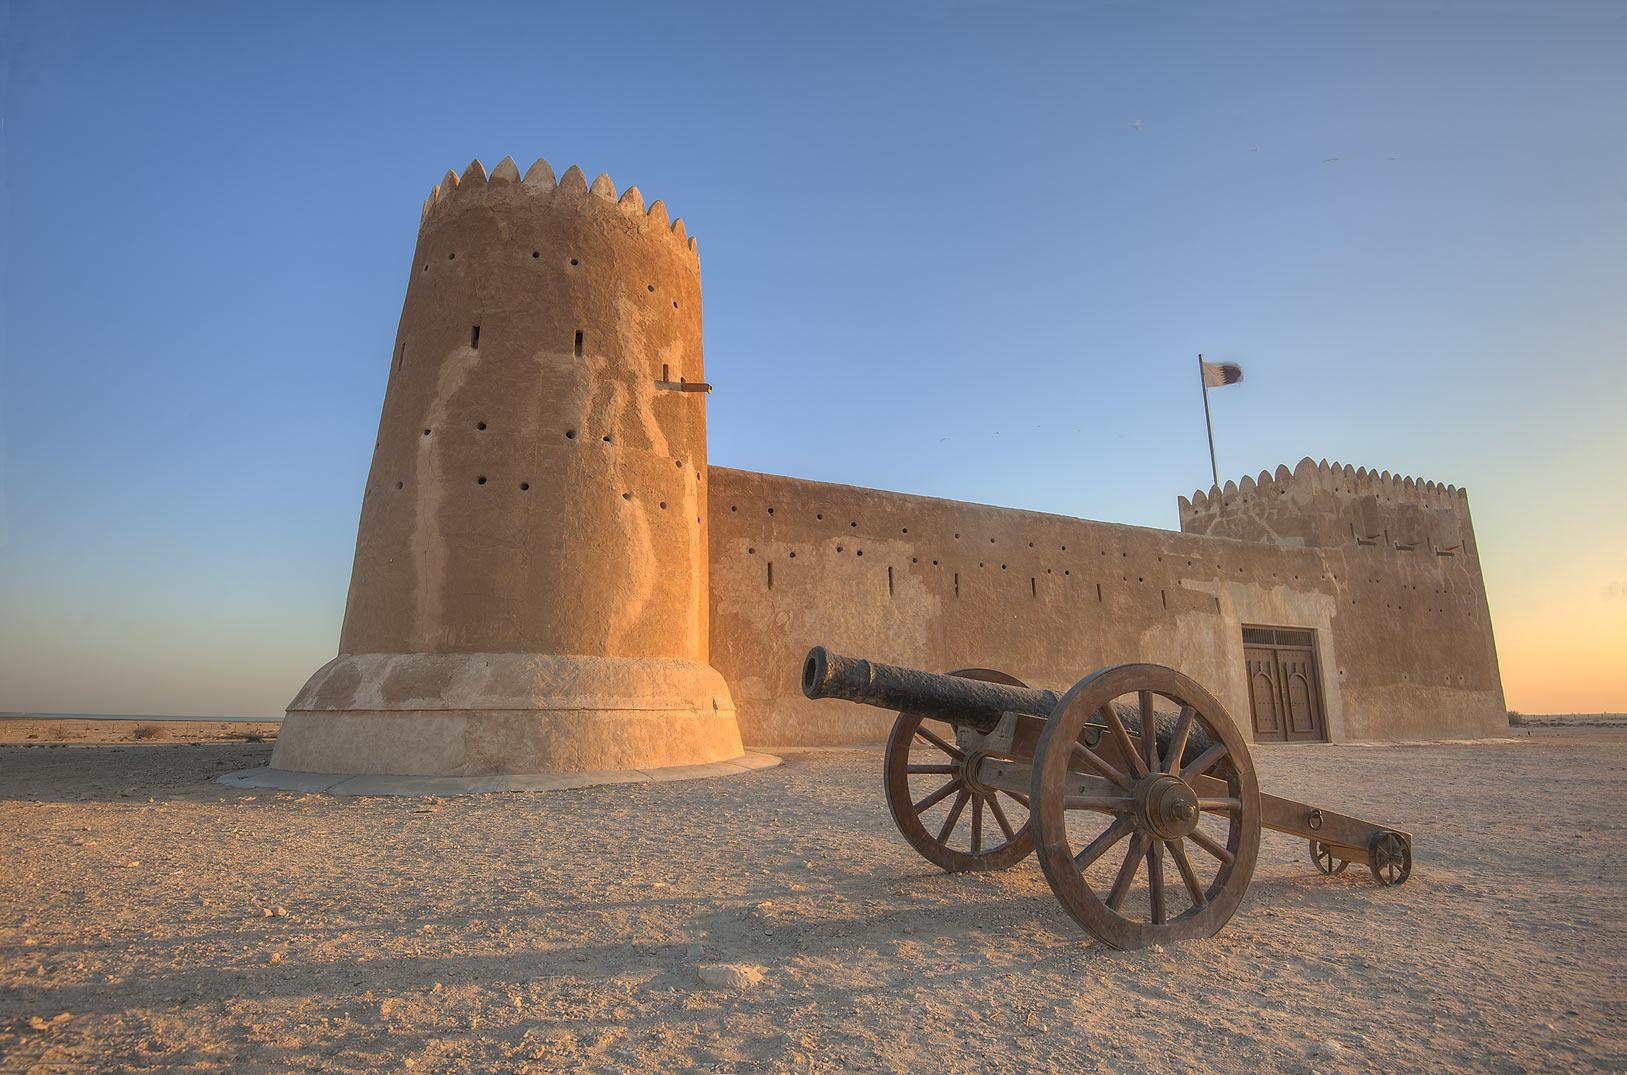 photo 161402 reconstructed zubara fort on northwest